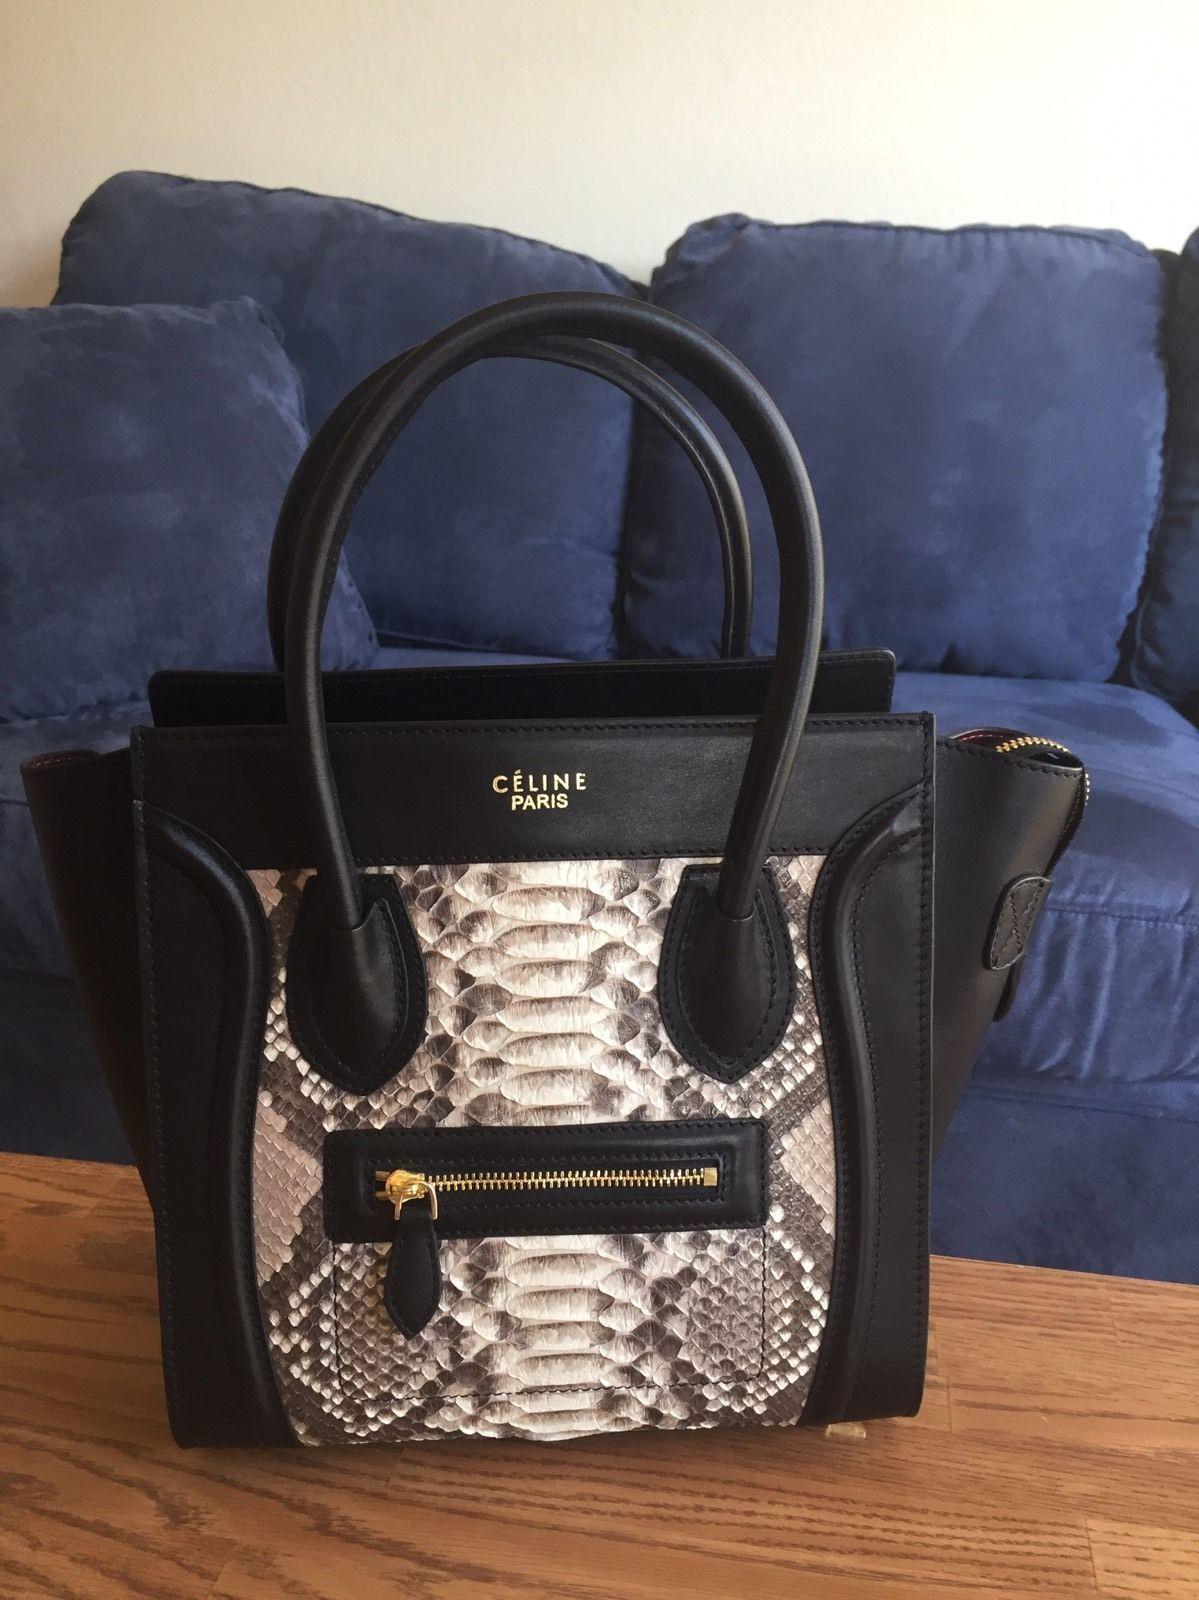 Celine Paris Phantom Luxury Mini Luggage Handbag Nano Baby Size Price Comparison